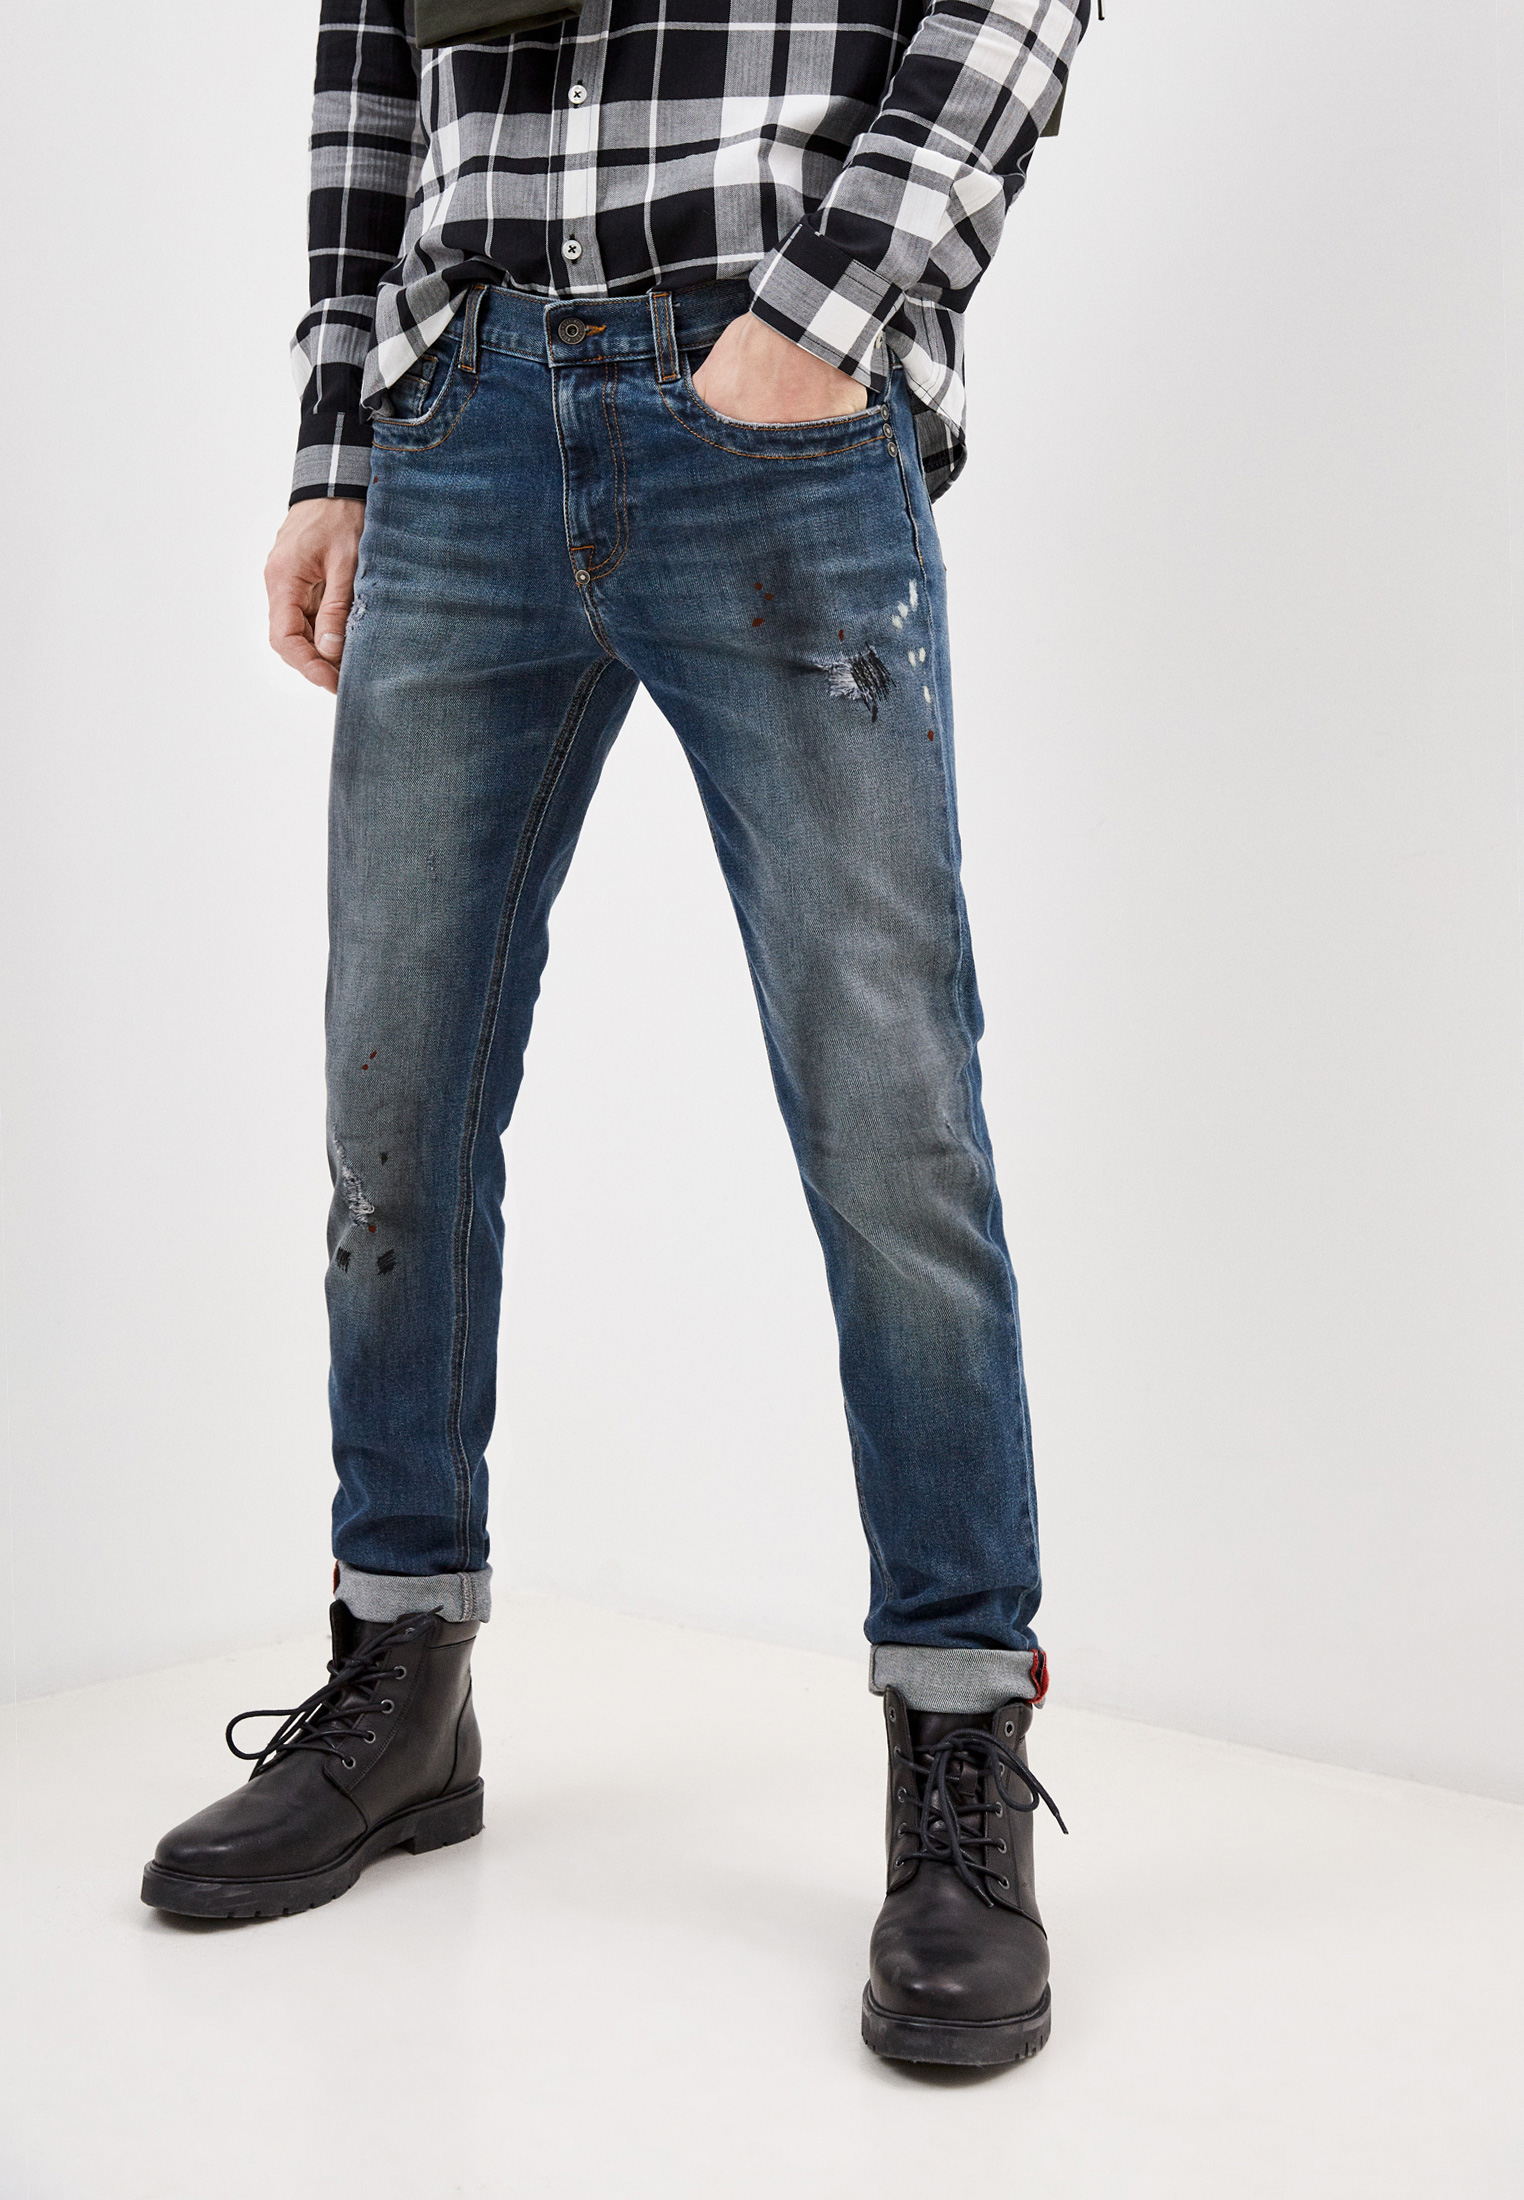 Мужские зауженные джинсы Bikkembergs (Биккембергс) C Q 101 10 S 3333